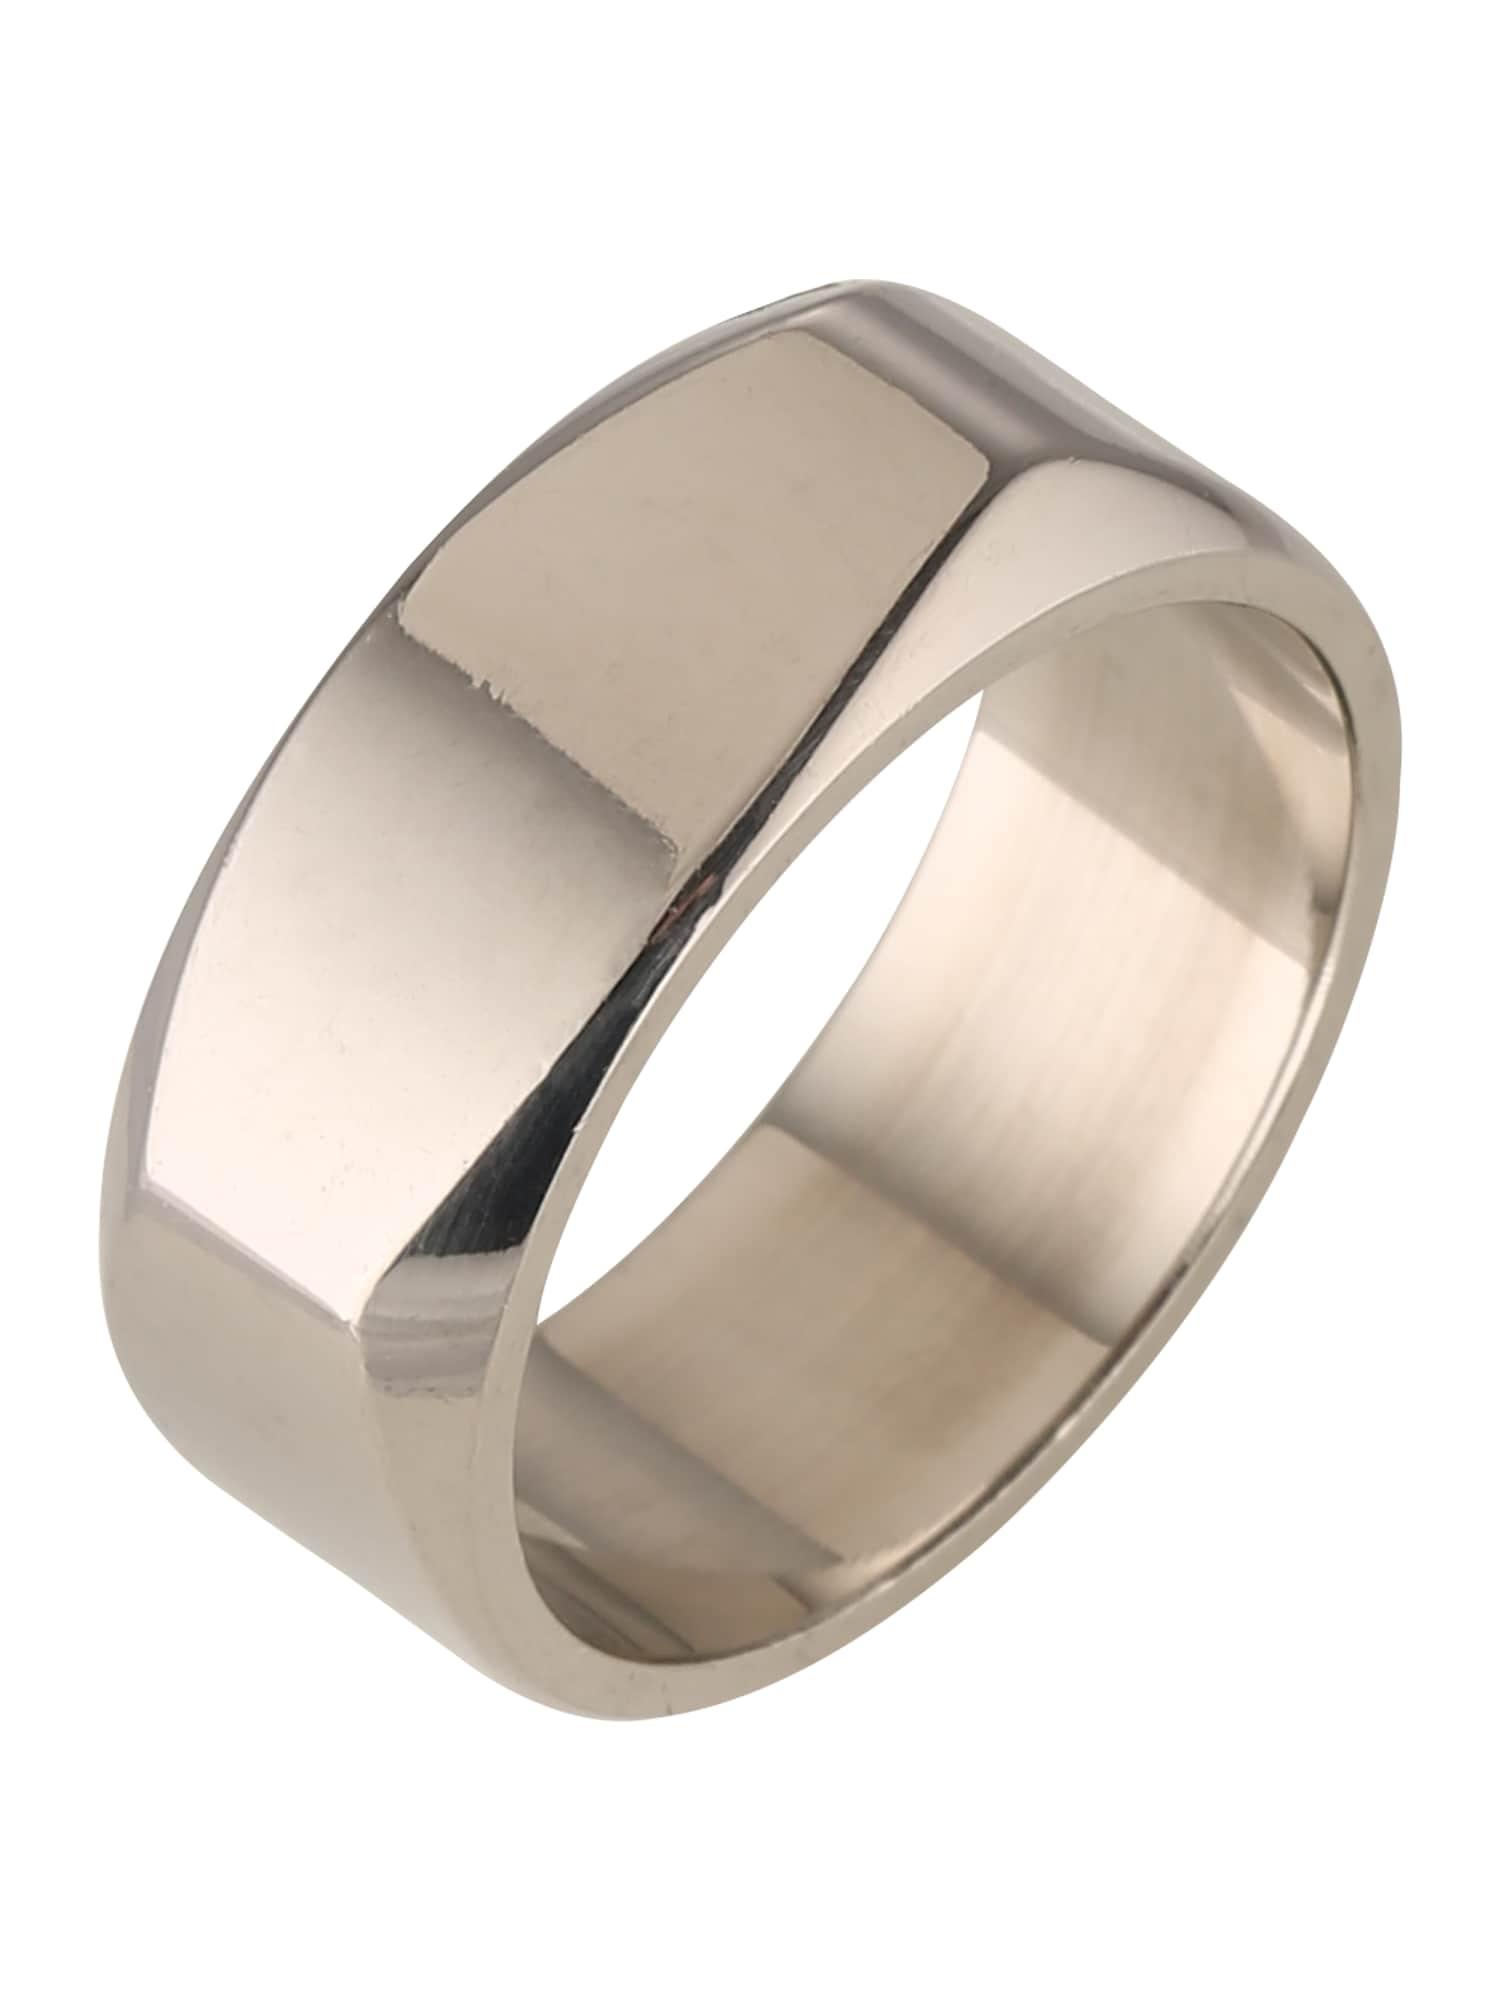 Prsten Ring Classic Line stříbrná ROYAL-EGO